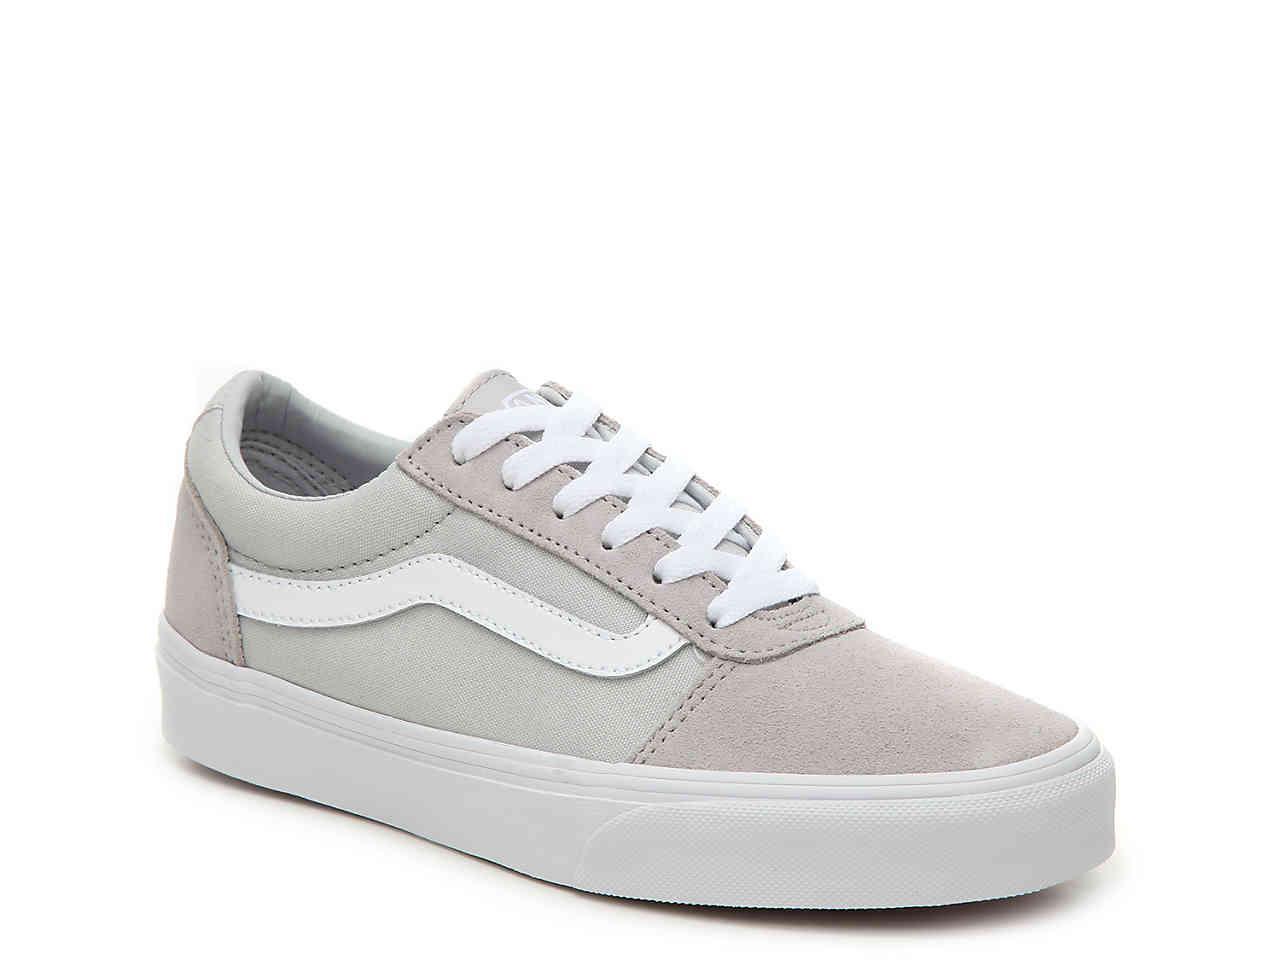 1125d028370d Lyst - Vans Ward Lo Sneaker in Gray